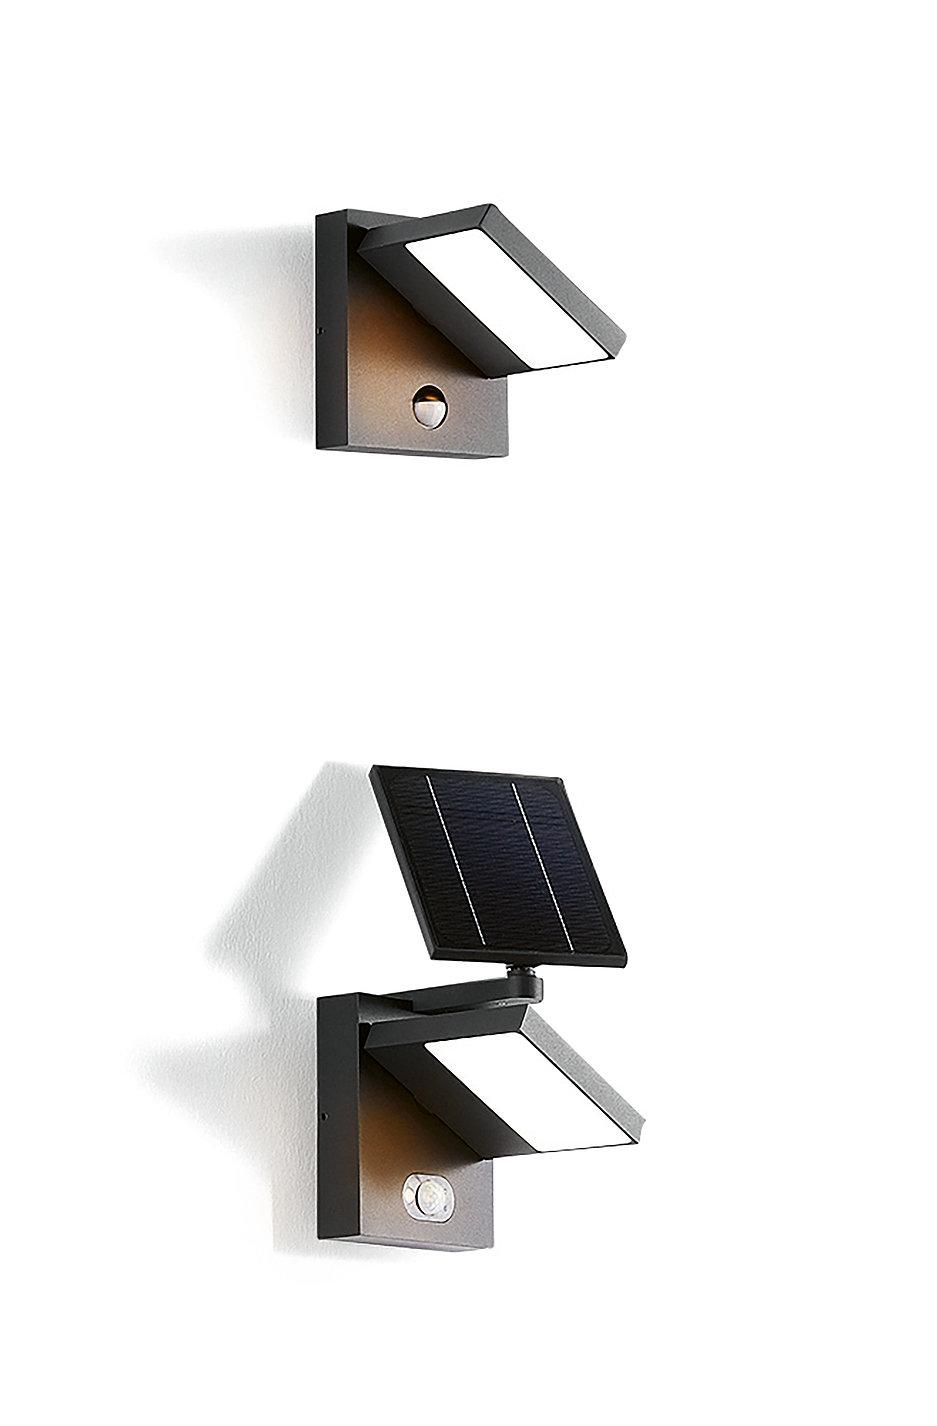 321-MODULAR | Red Dot Design Award